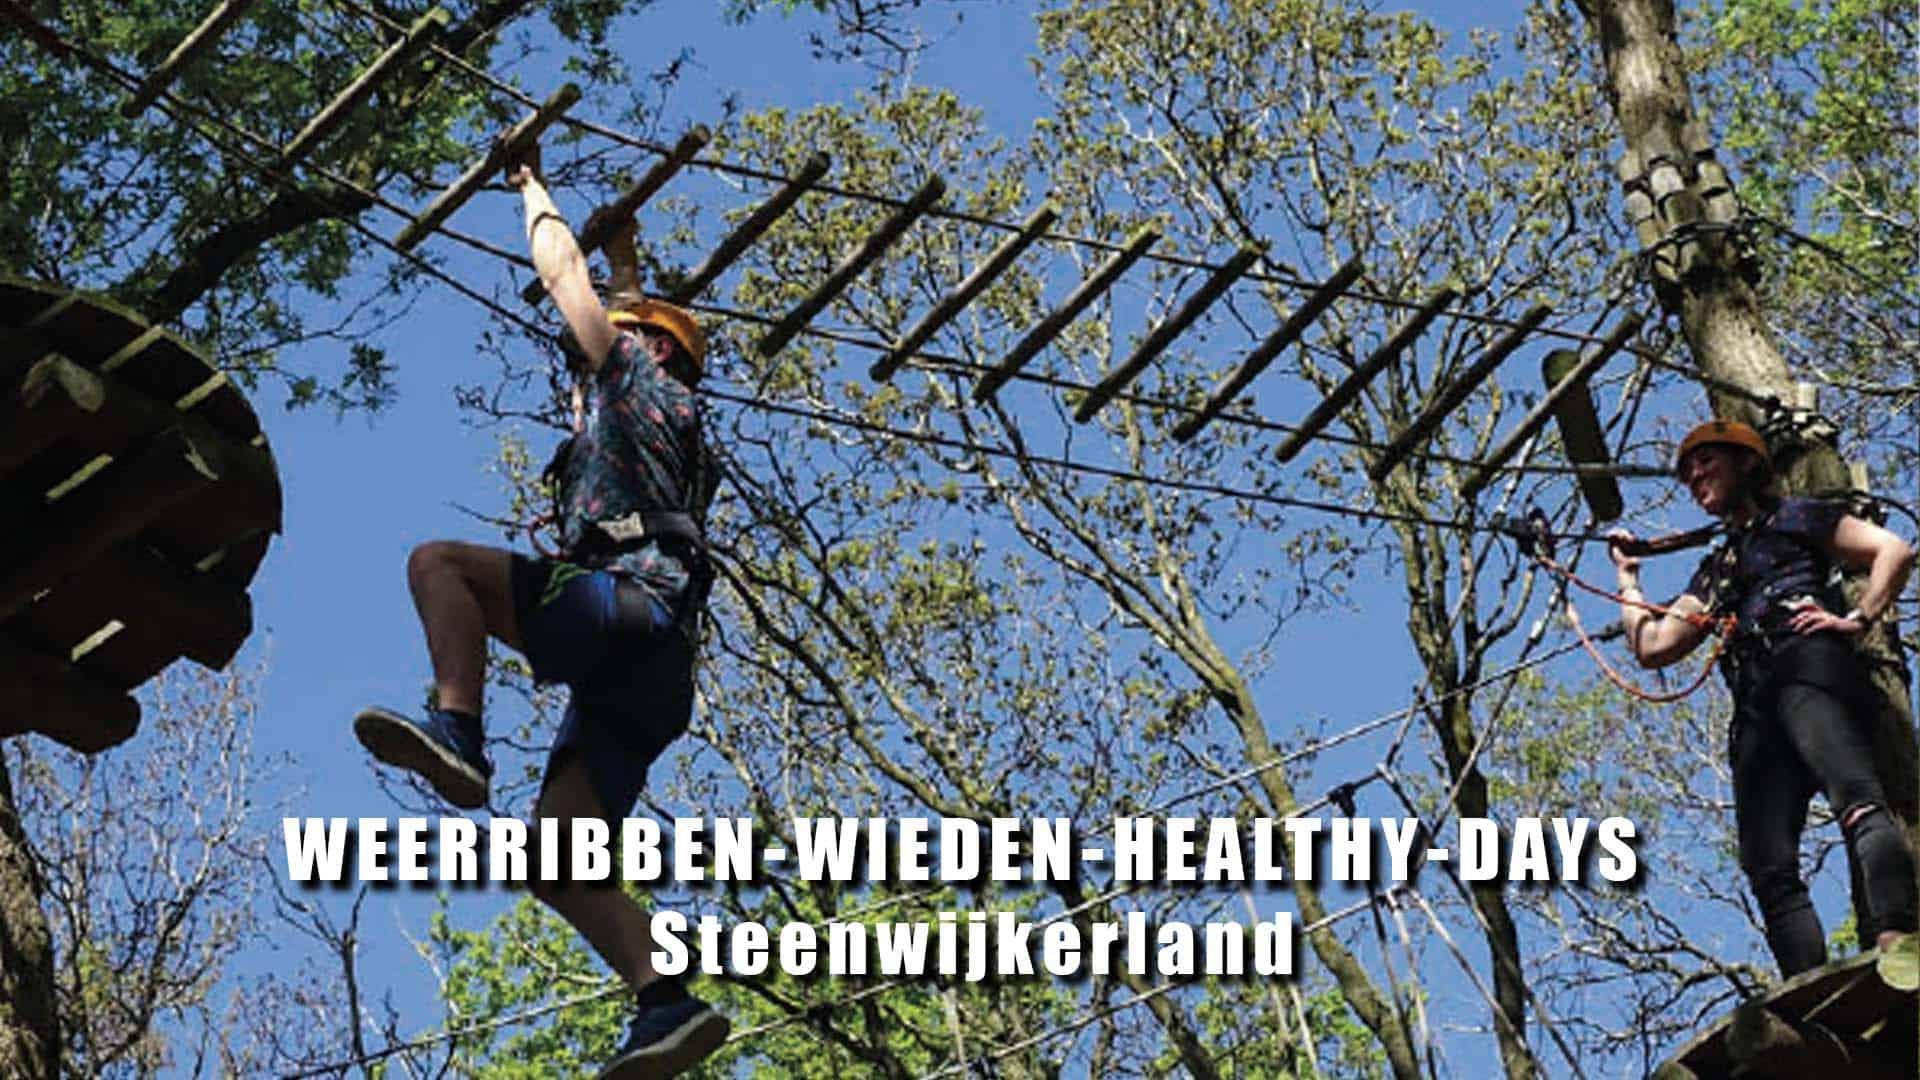 HEALTHY-DAYS Steenwijkerland